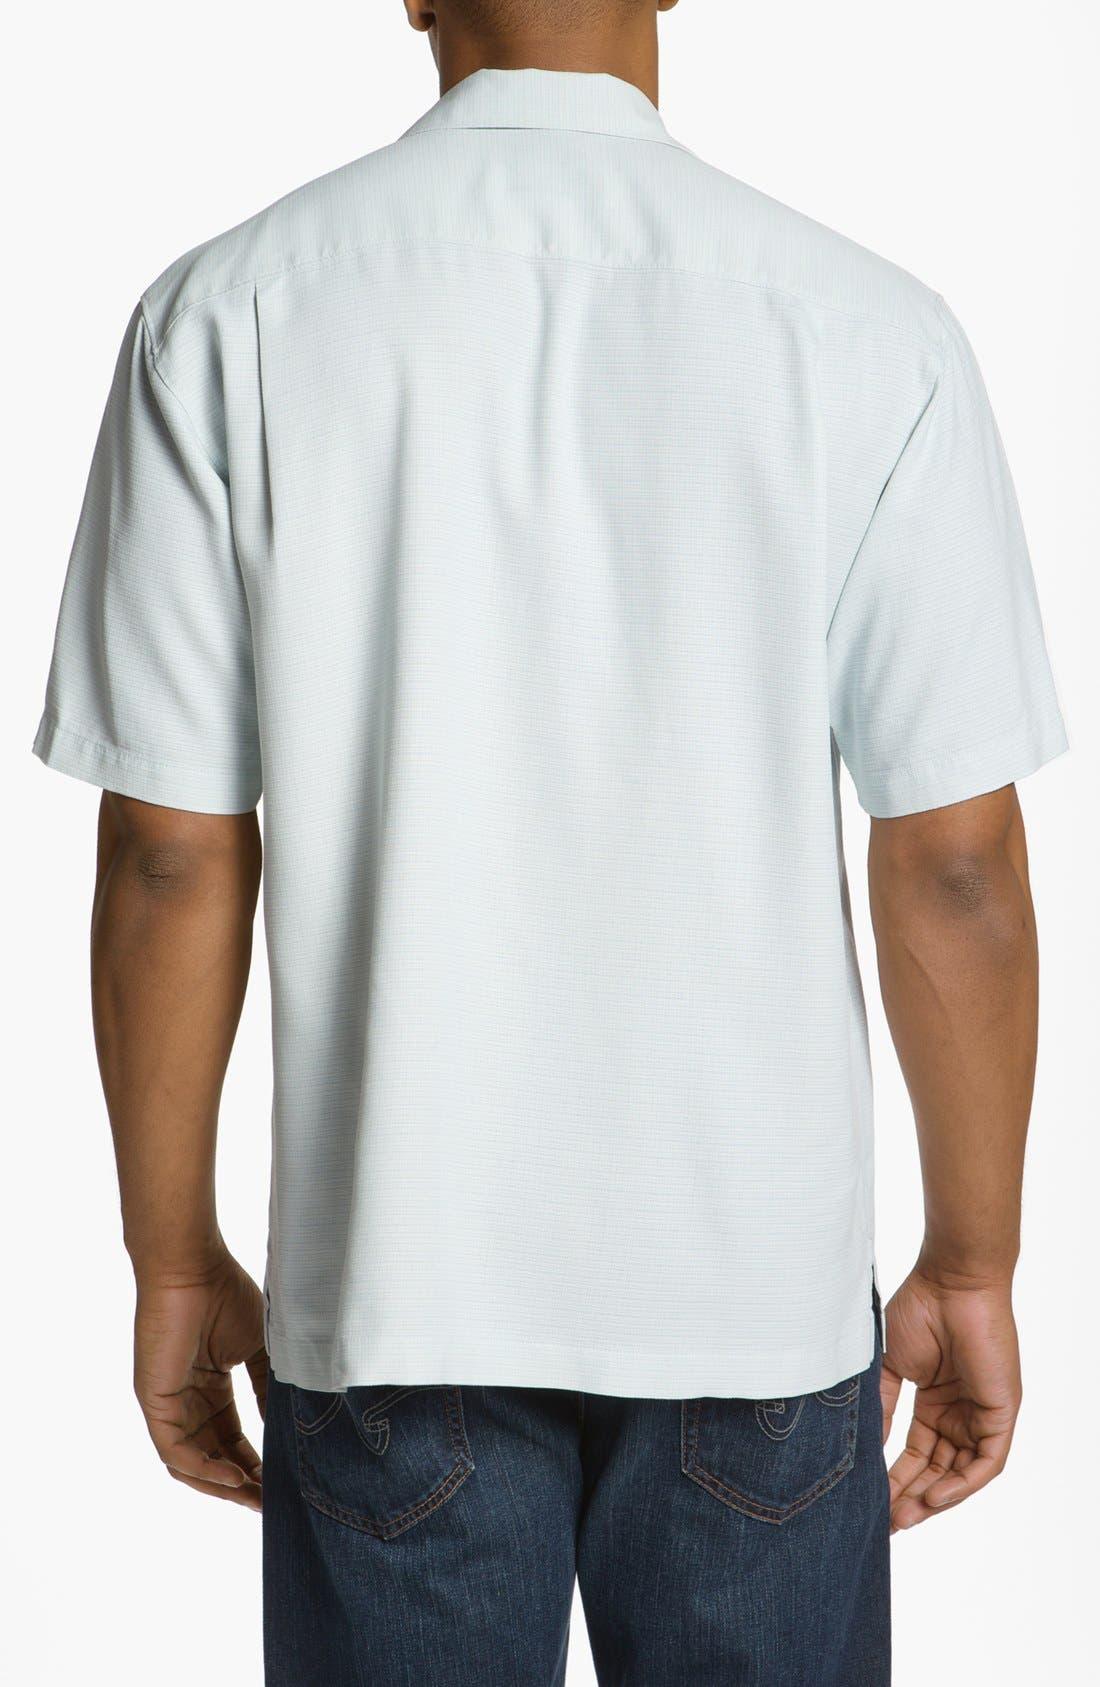 Alternate Image 2  - Tommy Bahama 'Amazon' Original Fit Silk Jacquard Camp Shirt